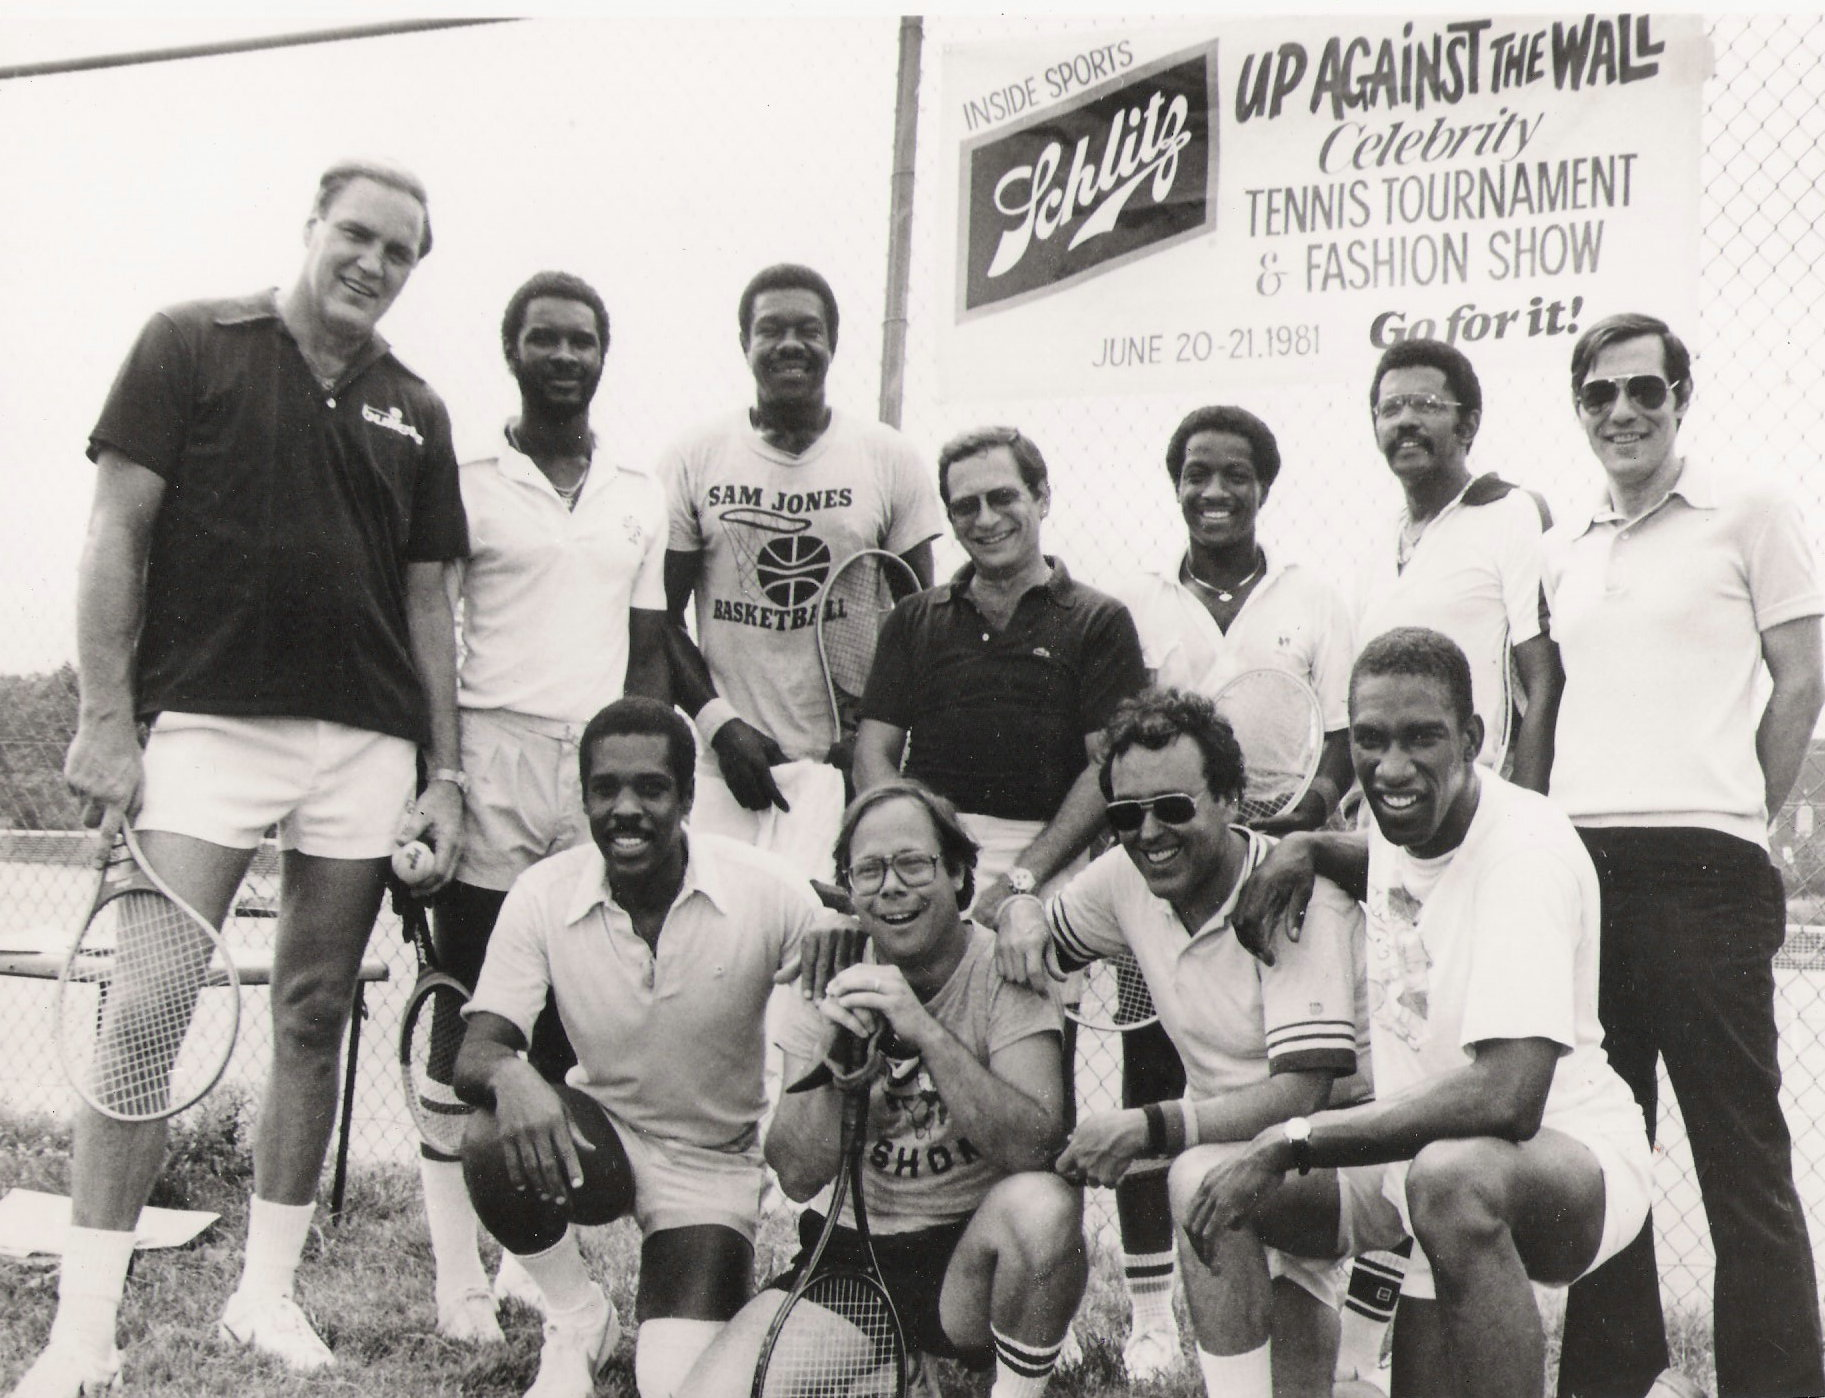 CELEBRITY TENNIS 1981 JVANCE